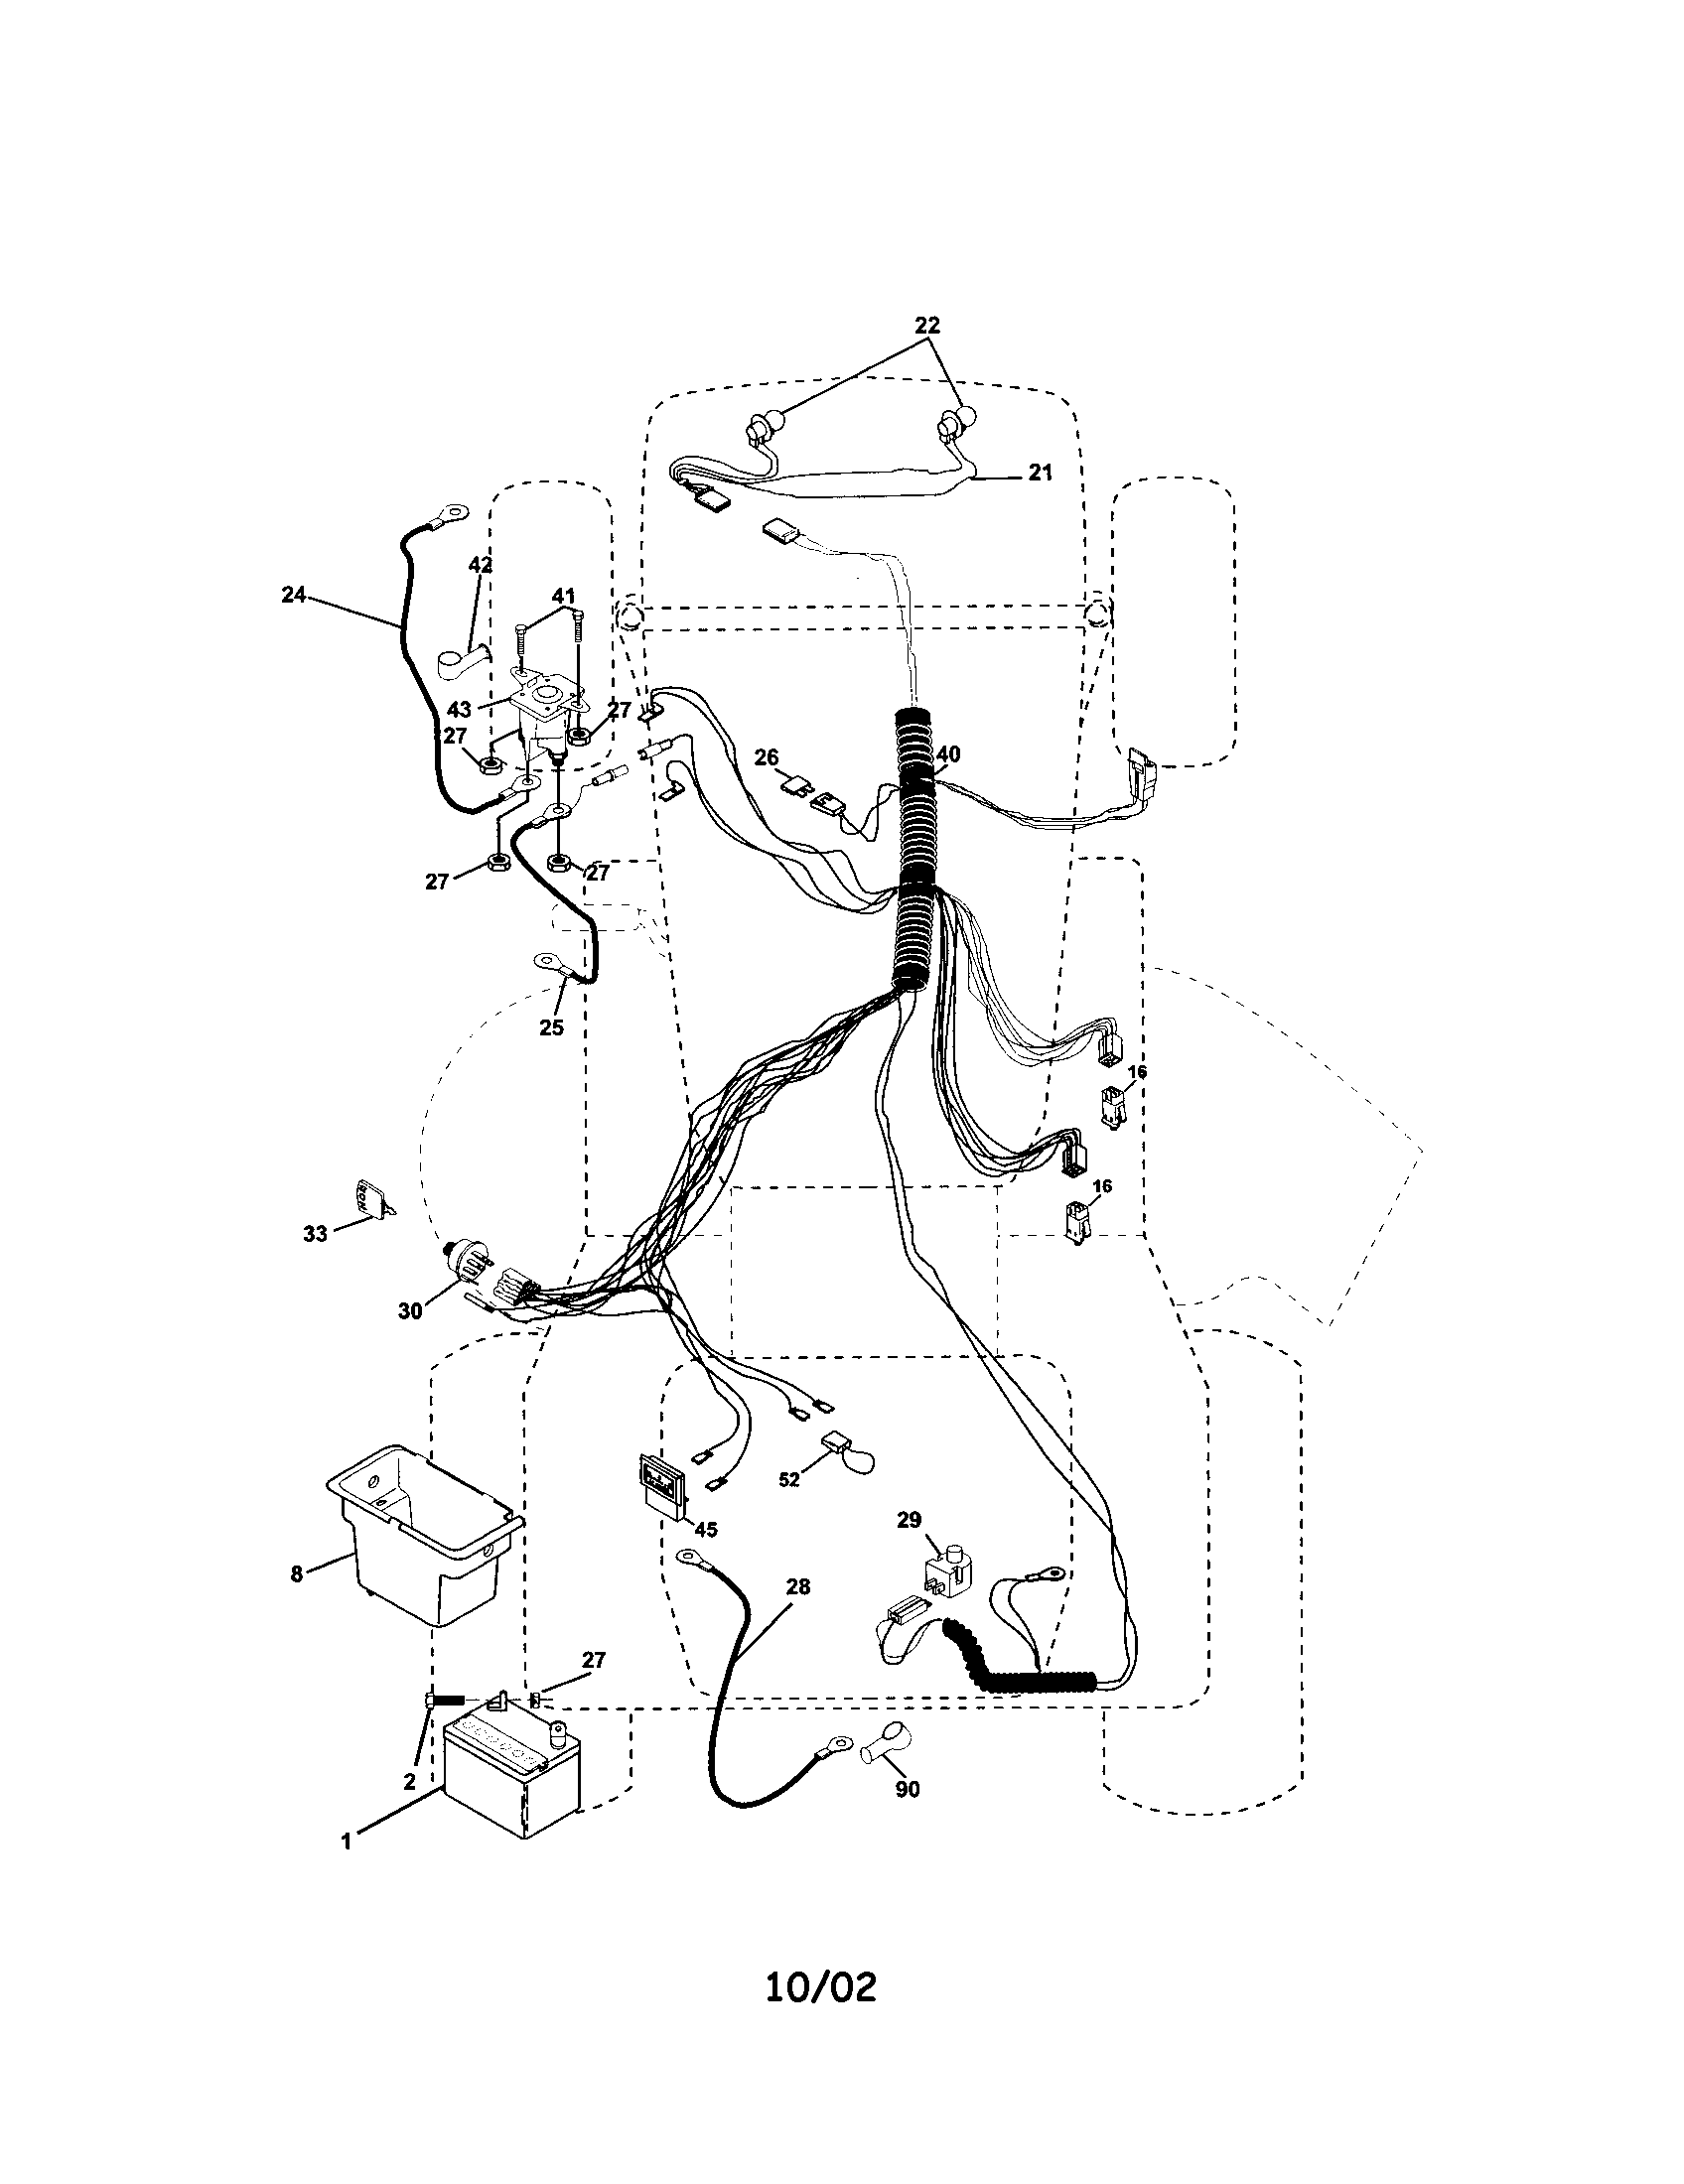 Wiring Diagram For Craftsman Lt1500 Riding Mower